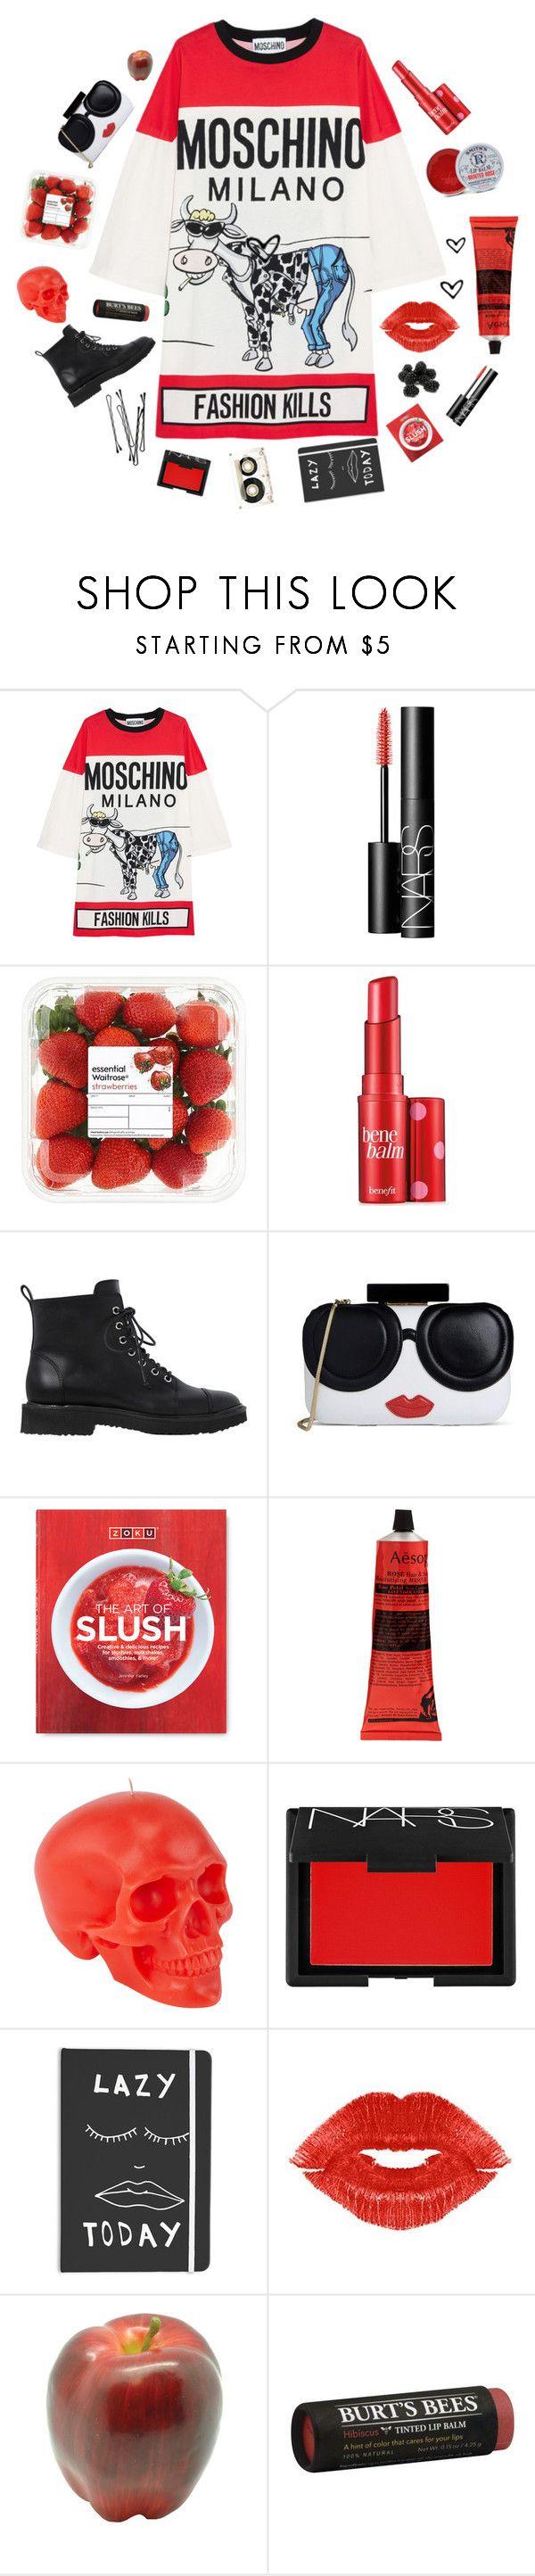 """Tee dress!!!!!"" by karineminzonwilson ❤ liked on Polyvore featuring Moschino, NARS Cosmetics, Benefit, Giuseppe Zanotti, Alice + Olivia, Rosebud Perfume Co., Zoku, Aesop, D.L. & Co. and BOBBY"